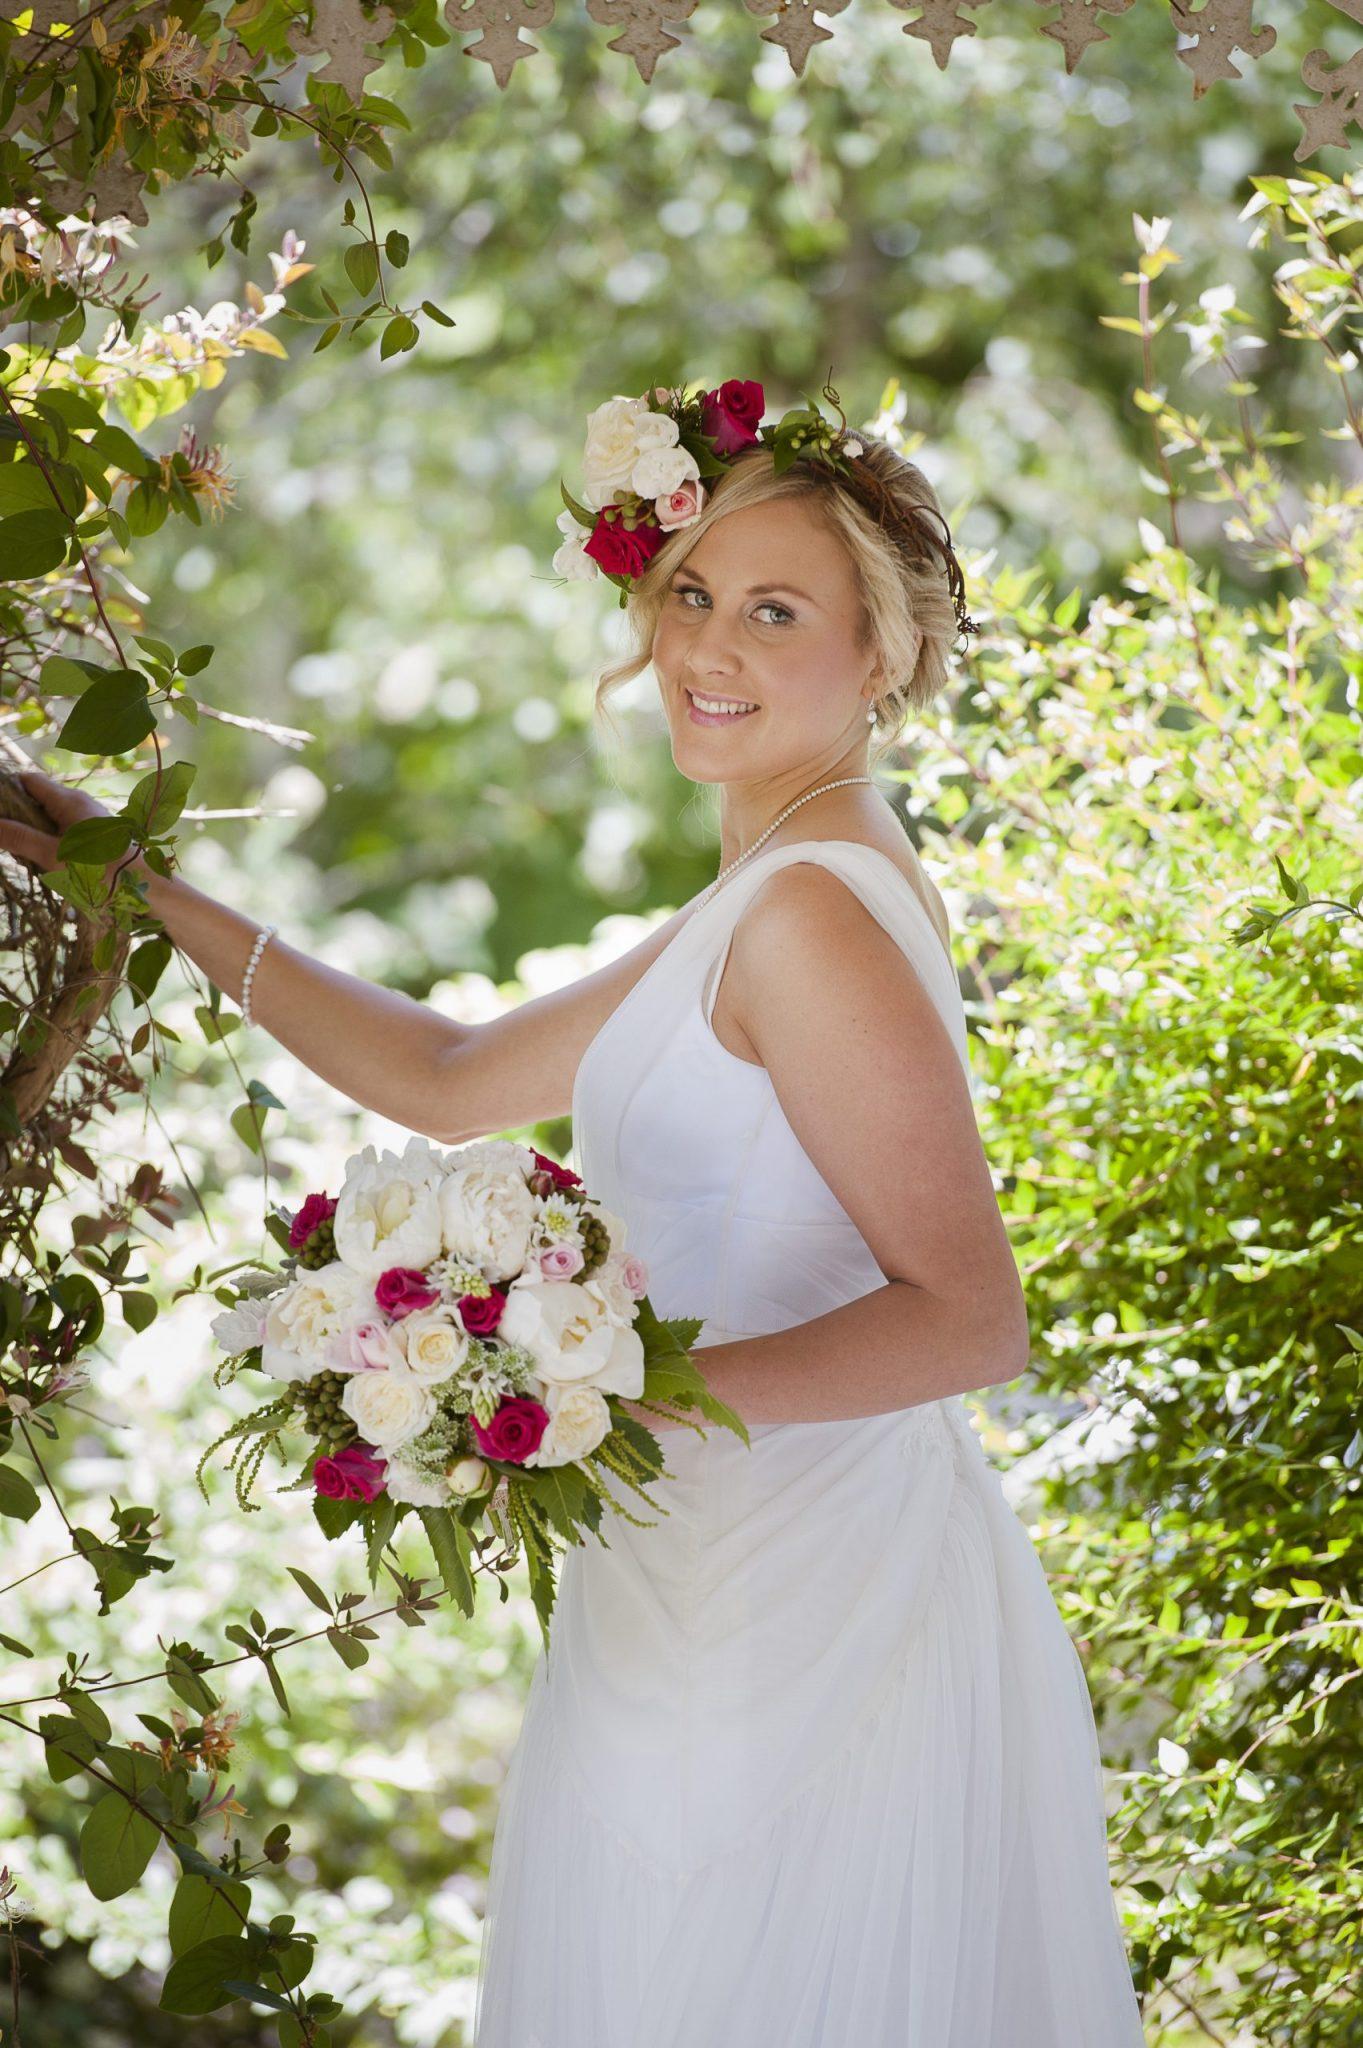 wedding flowers, vintage bride, Daylesford wedding, country wedding, vintage wedding